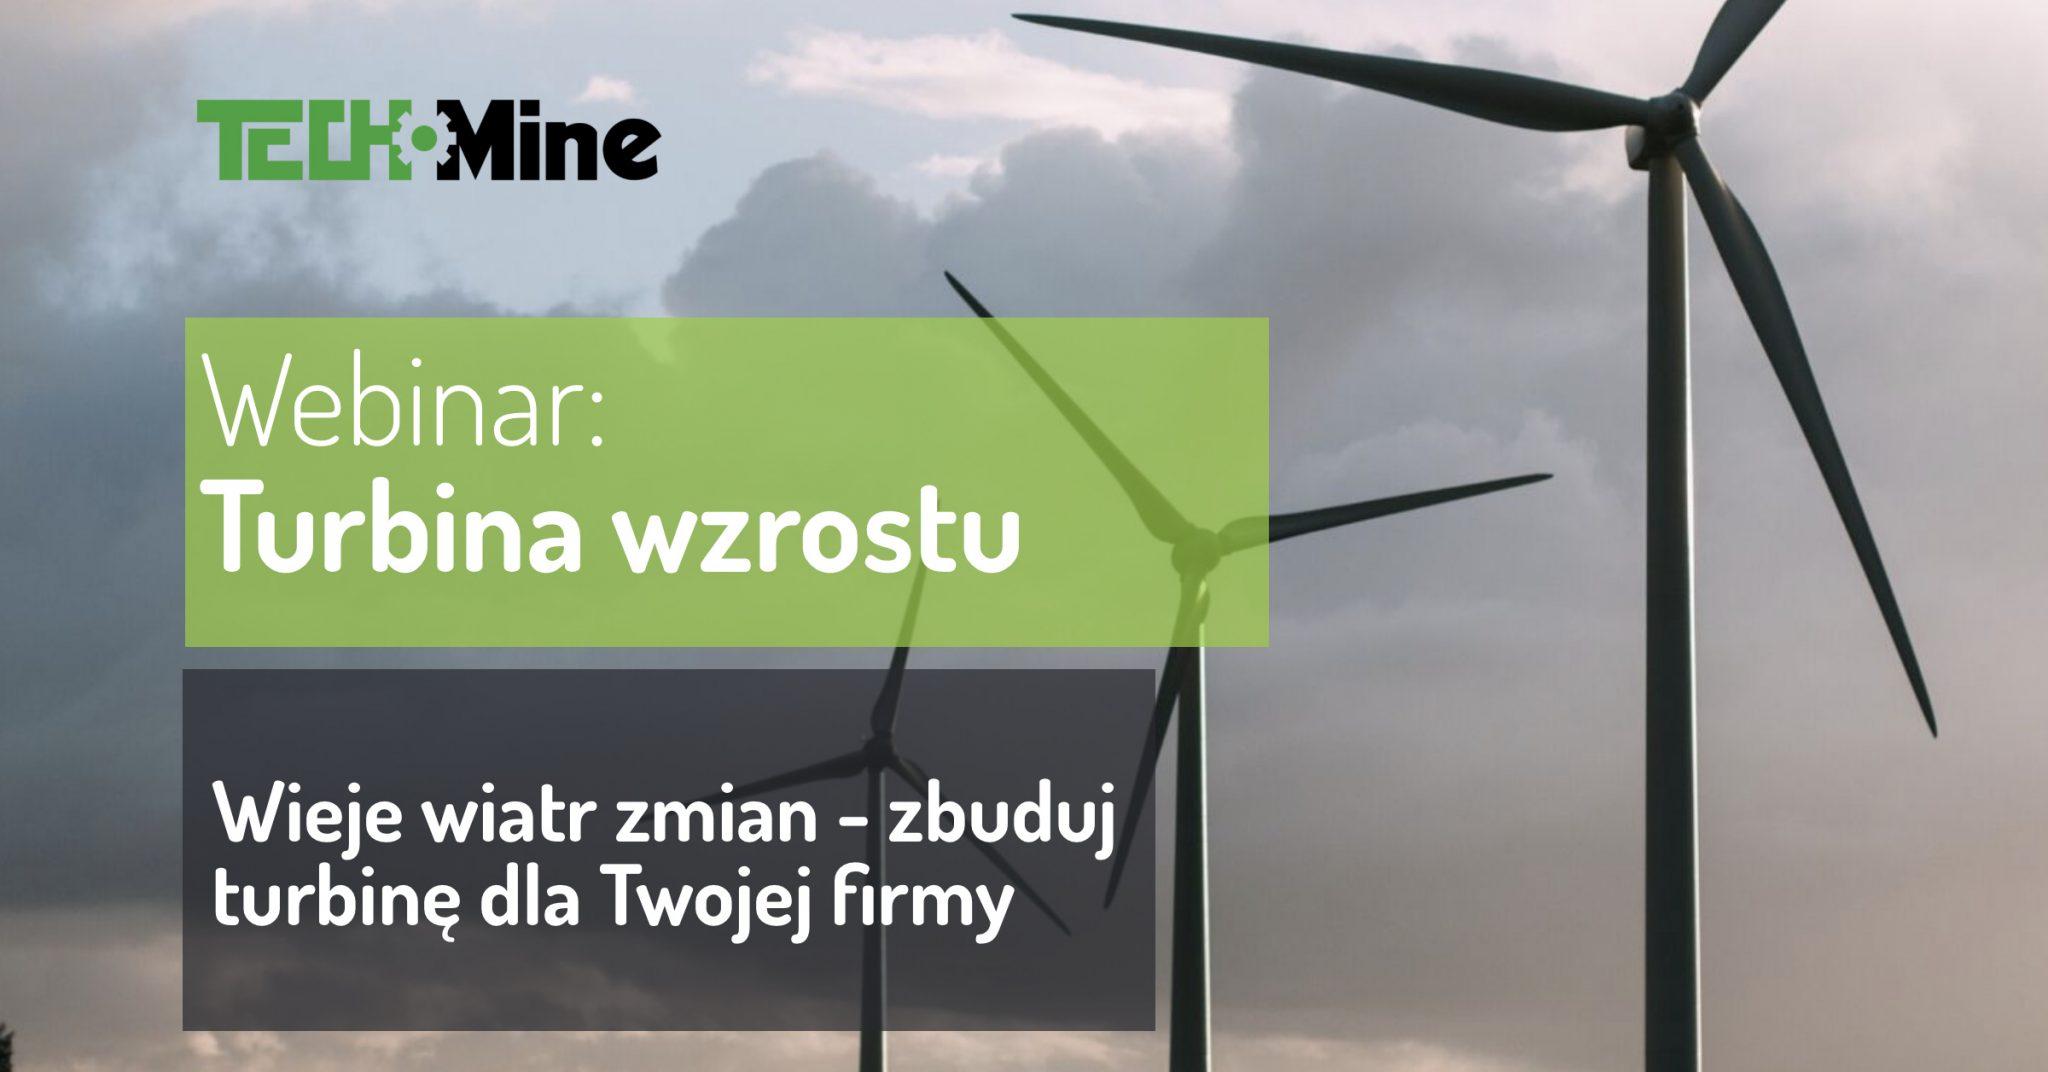 turbina wzrostu webinar